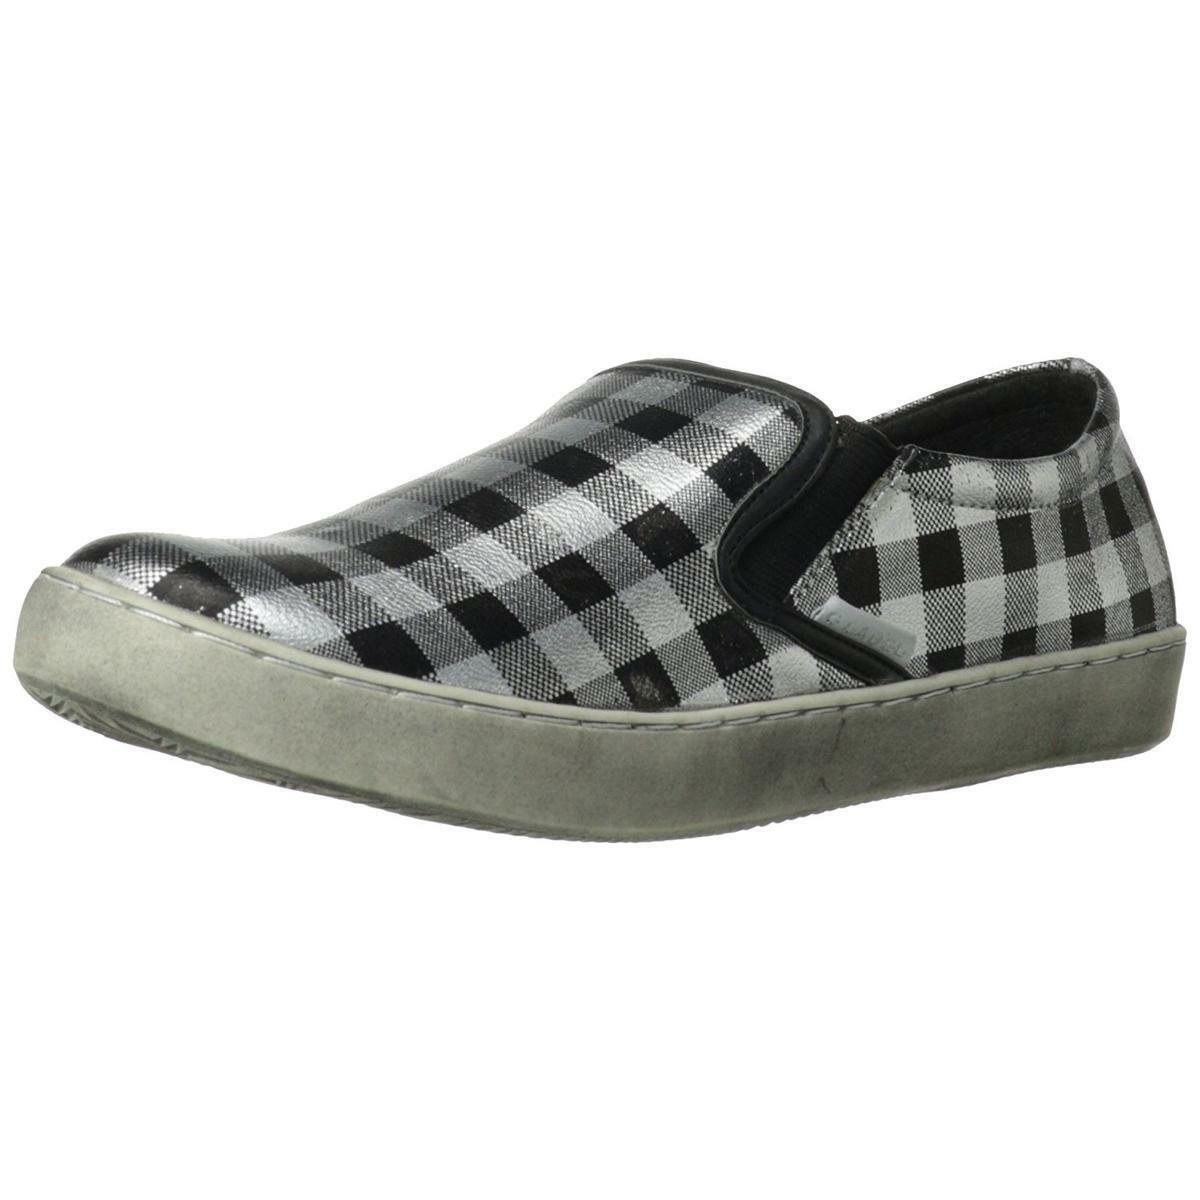 C Label Randy-7B Women's Silver/Black Slip On Loafer